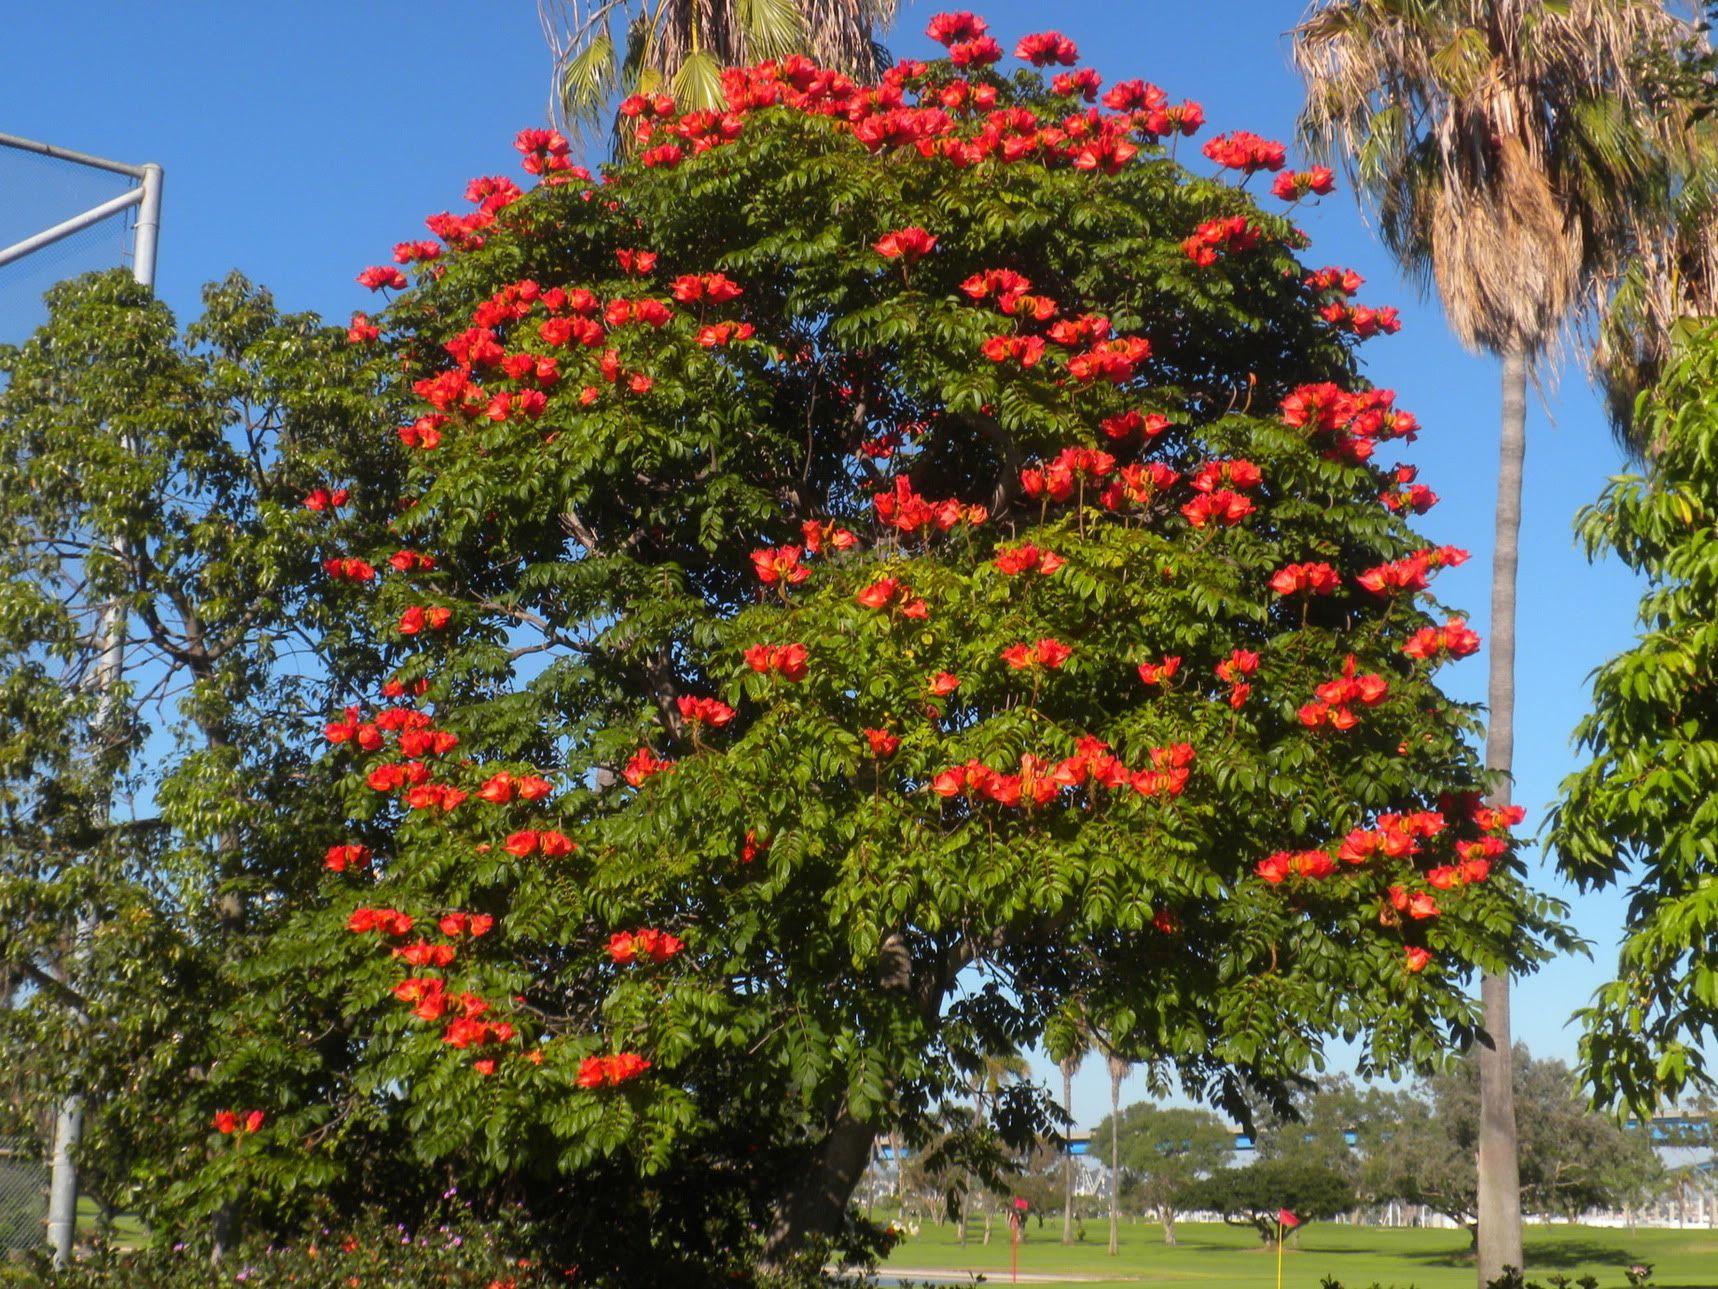 тюльпановое дерево фото в абхазии упорно над